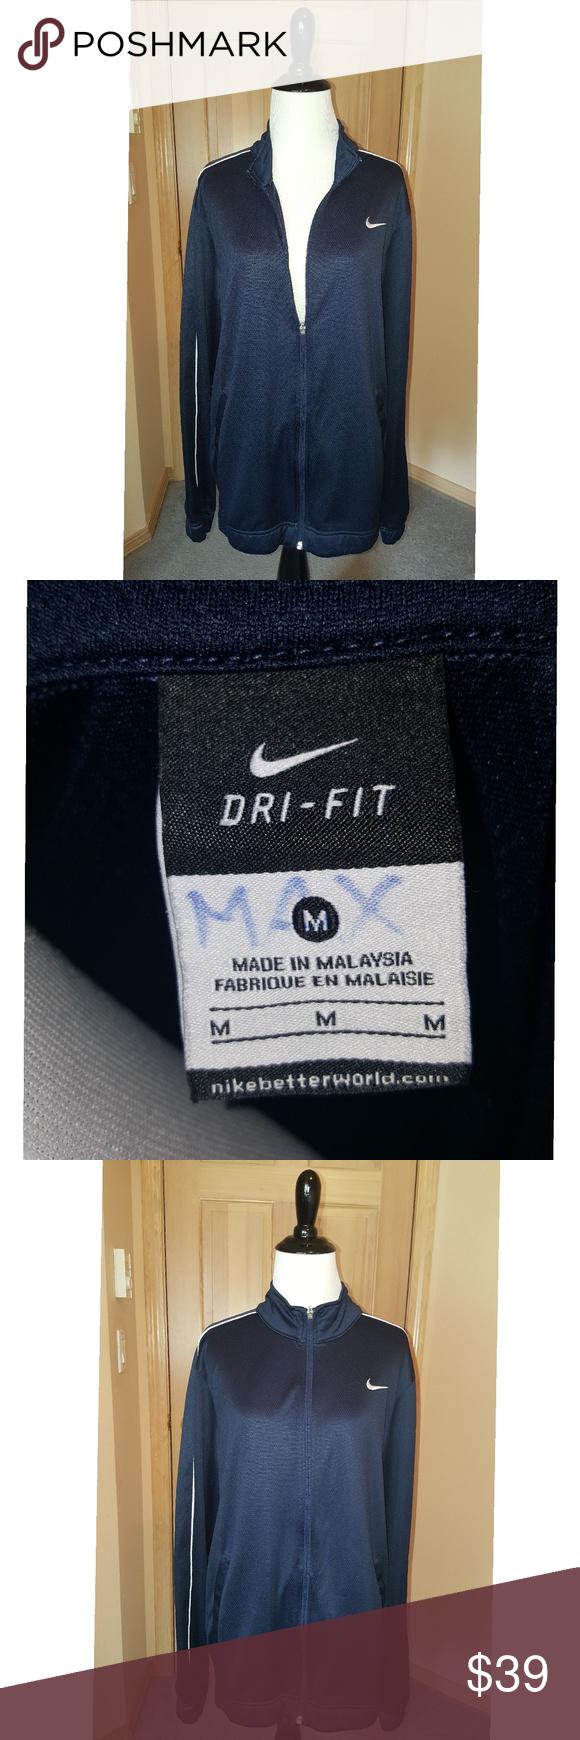 NIKE Men's Blue DRIFIT FullZip Jacket Great meshlooking